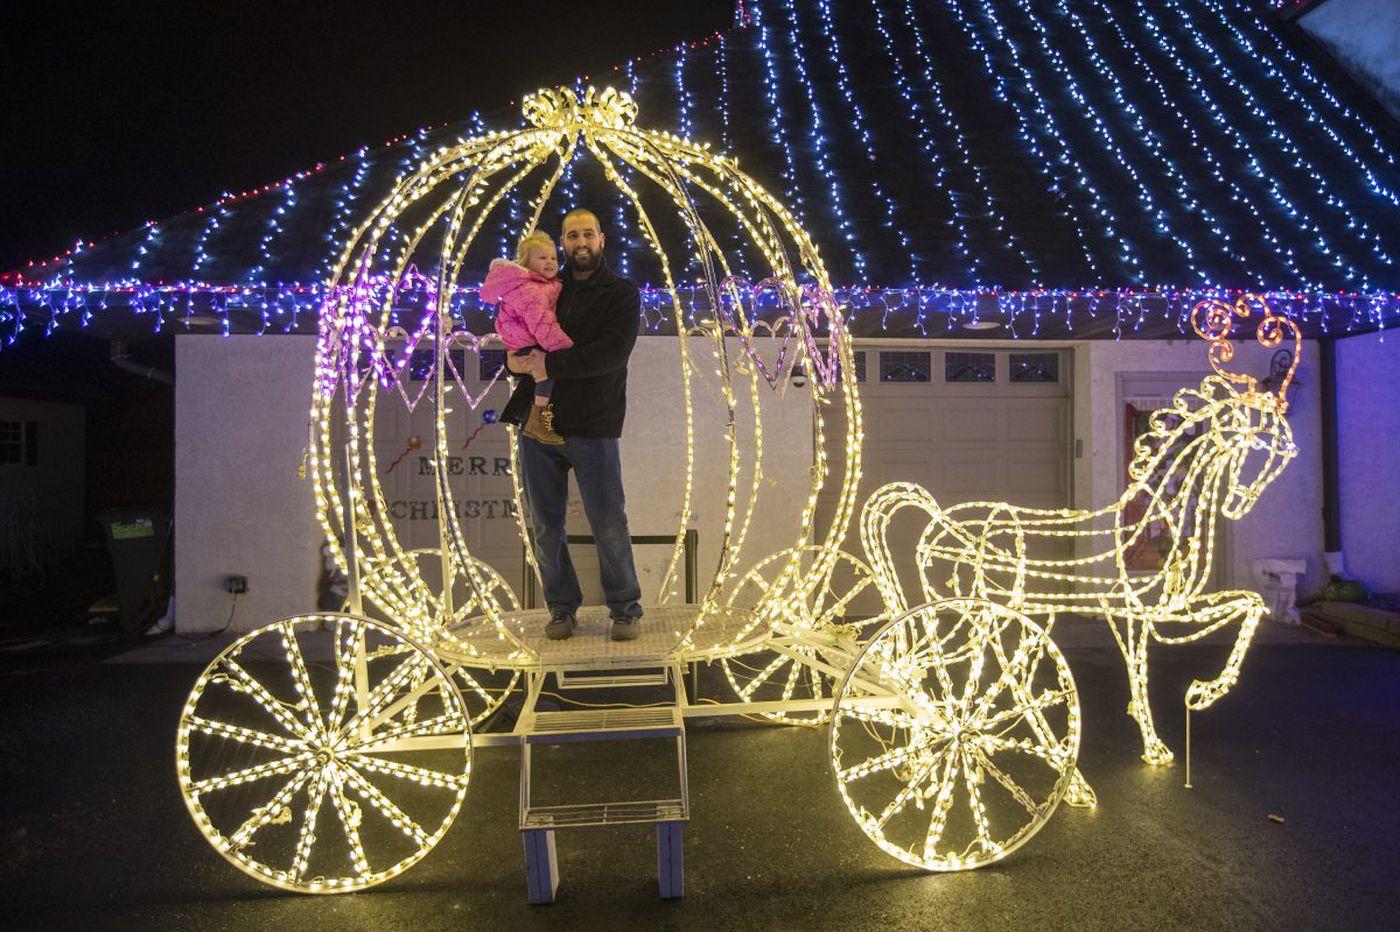 Christmas wonderland stops traffic, raises money in Ambler